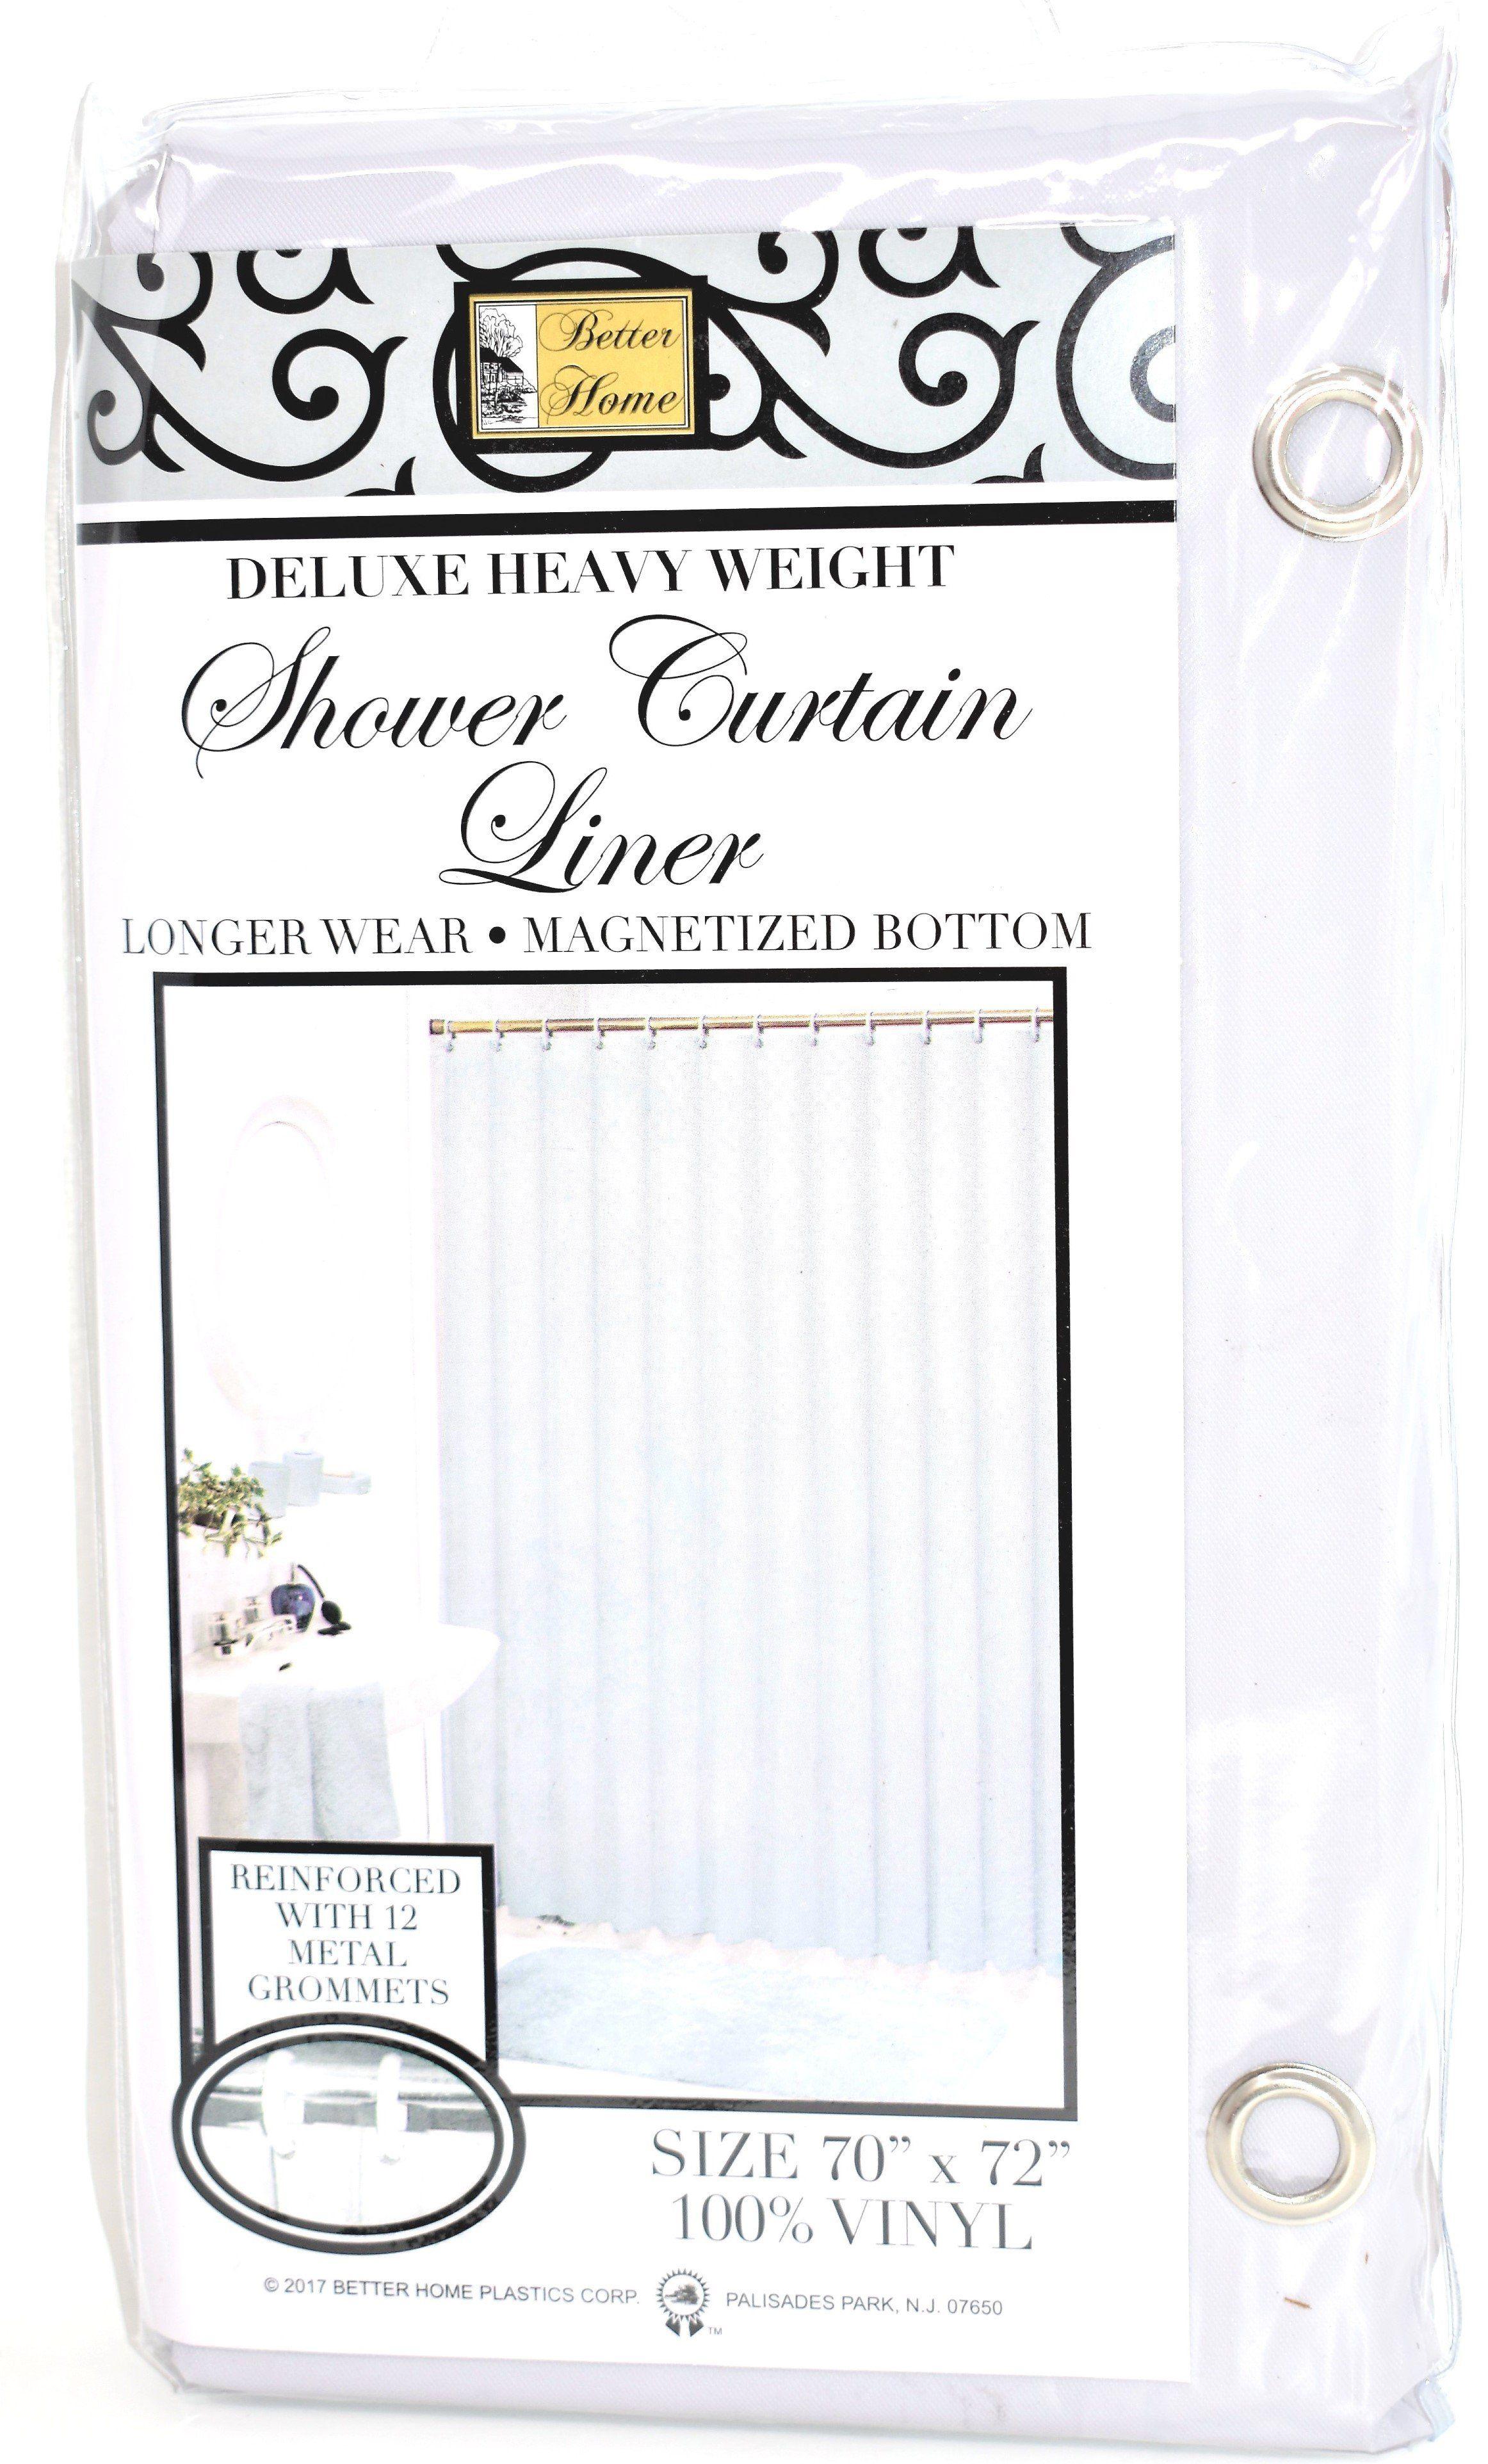 Deluxe Heavy Weight 100 Vinyl Shower Curtain Liner 70 X 72 Grey Color Vinyl Shower Curtains Shower Curtains